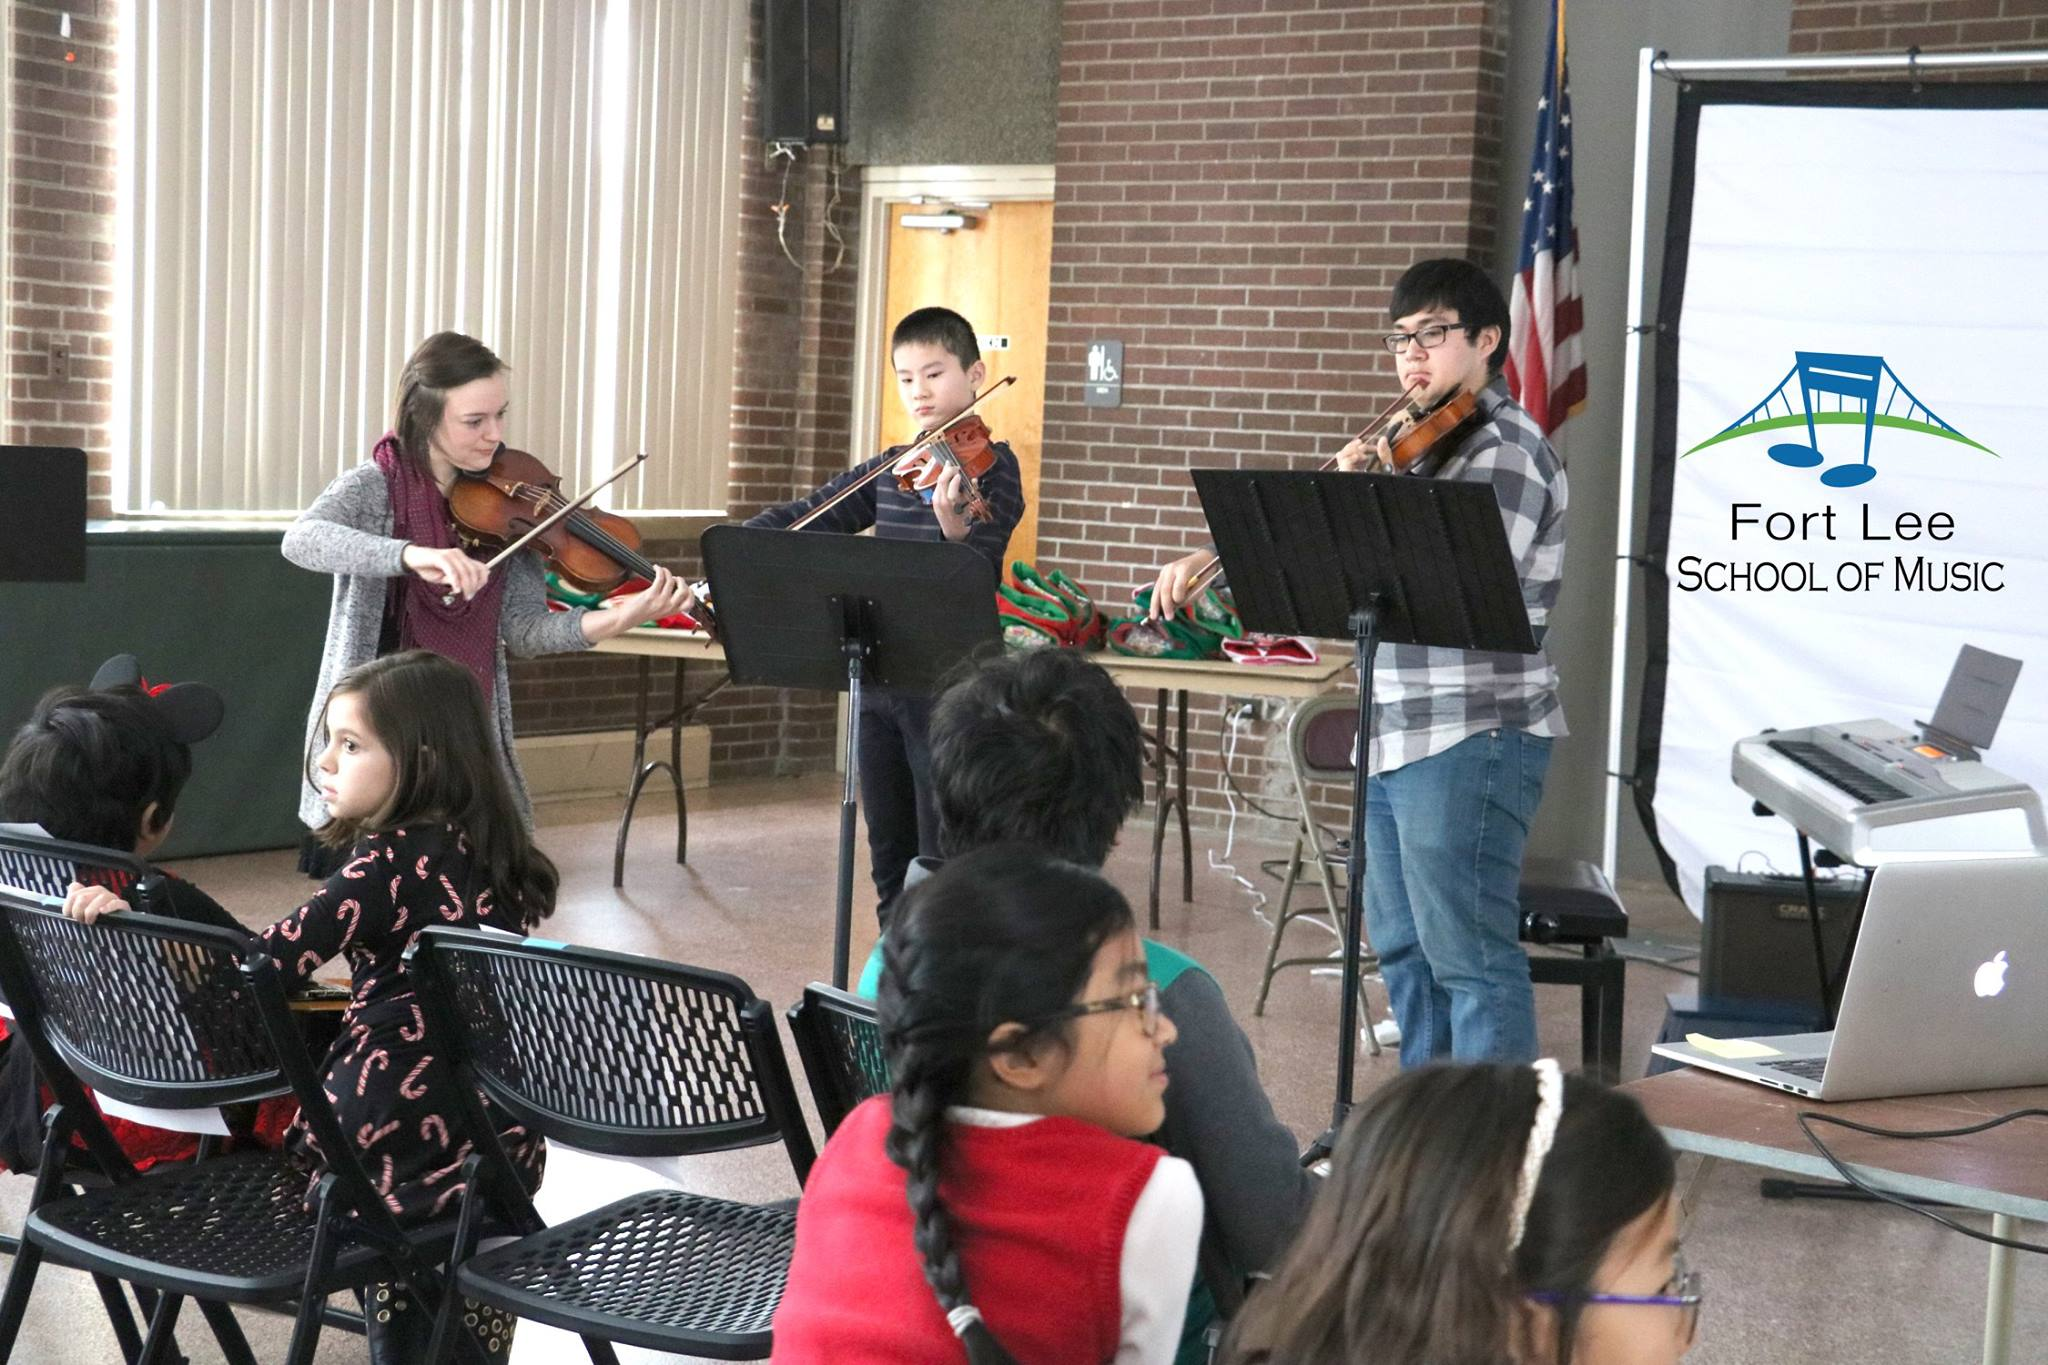 advanced-violin-lessons-in-fort-lee.jpg